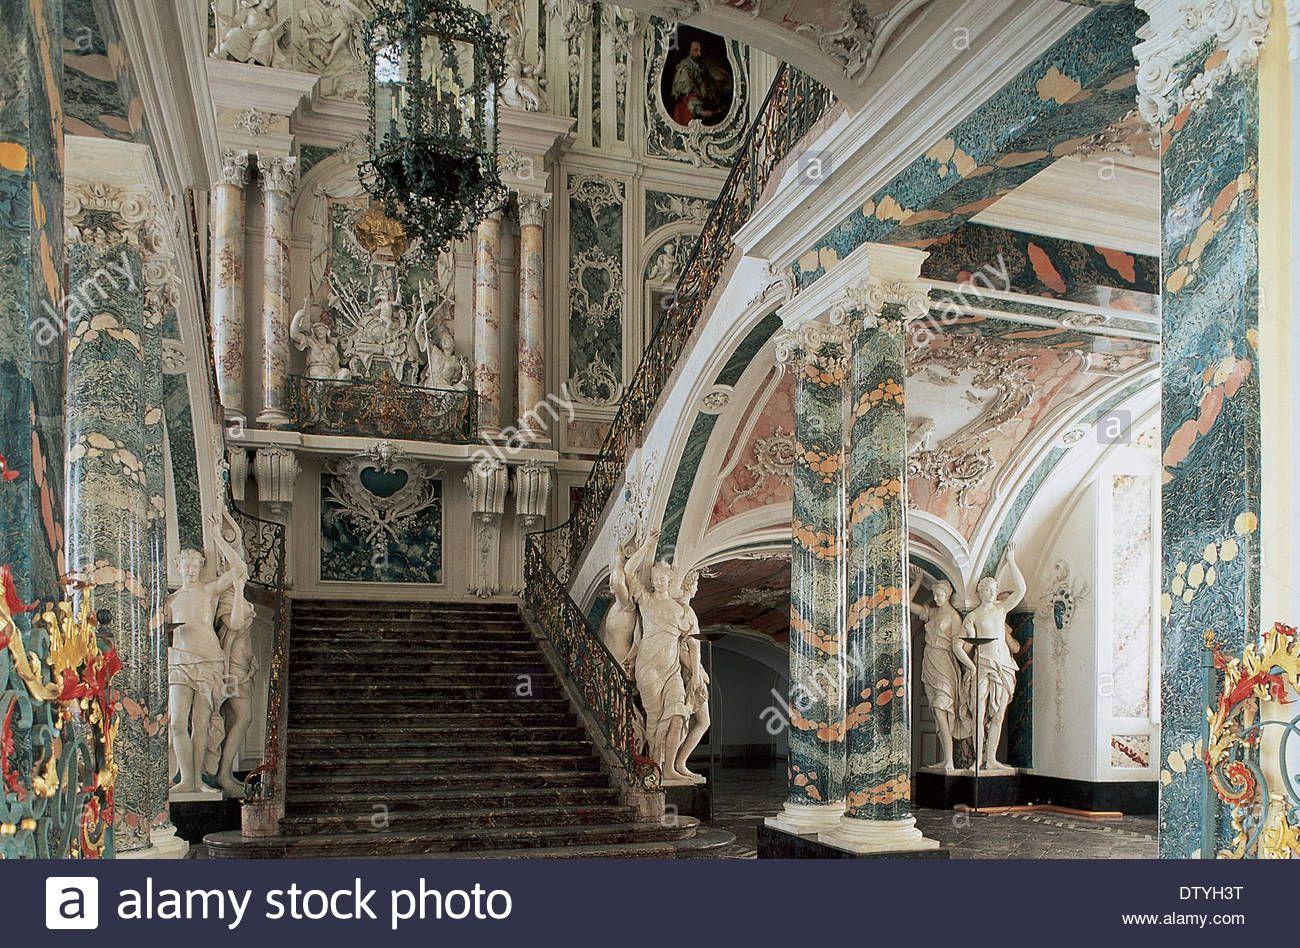 Germany Bruhl Augustusburg Palace Rococo Staircase Designed By Johann Balthasar Neumann Stock Photo Bruhl 18th Century Poster Prints